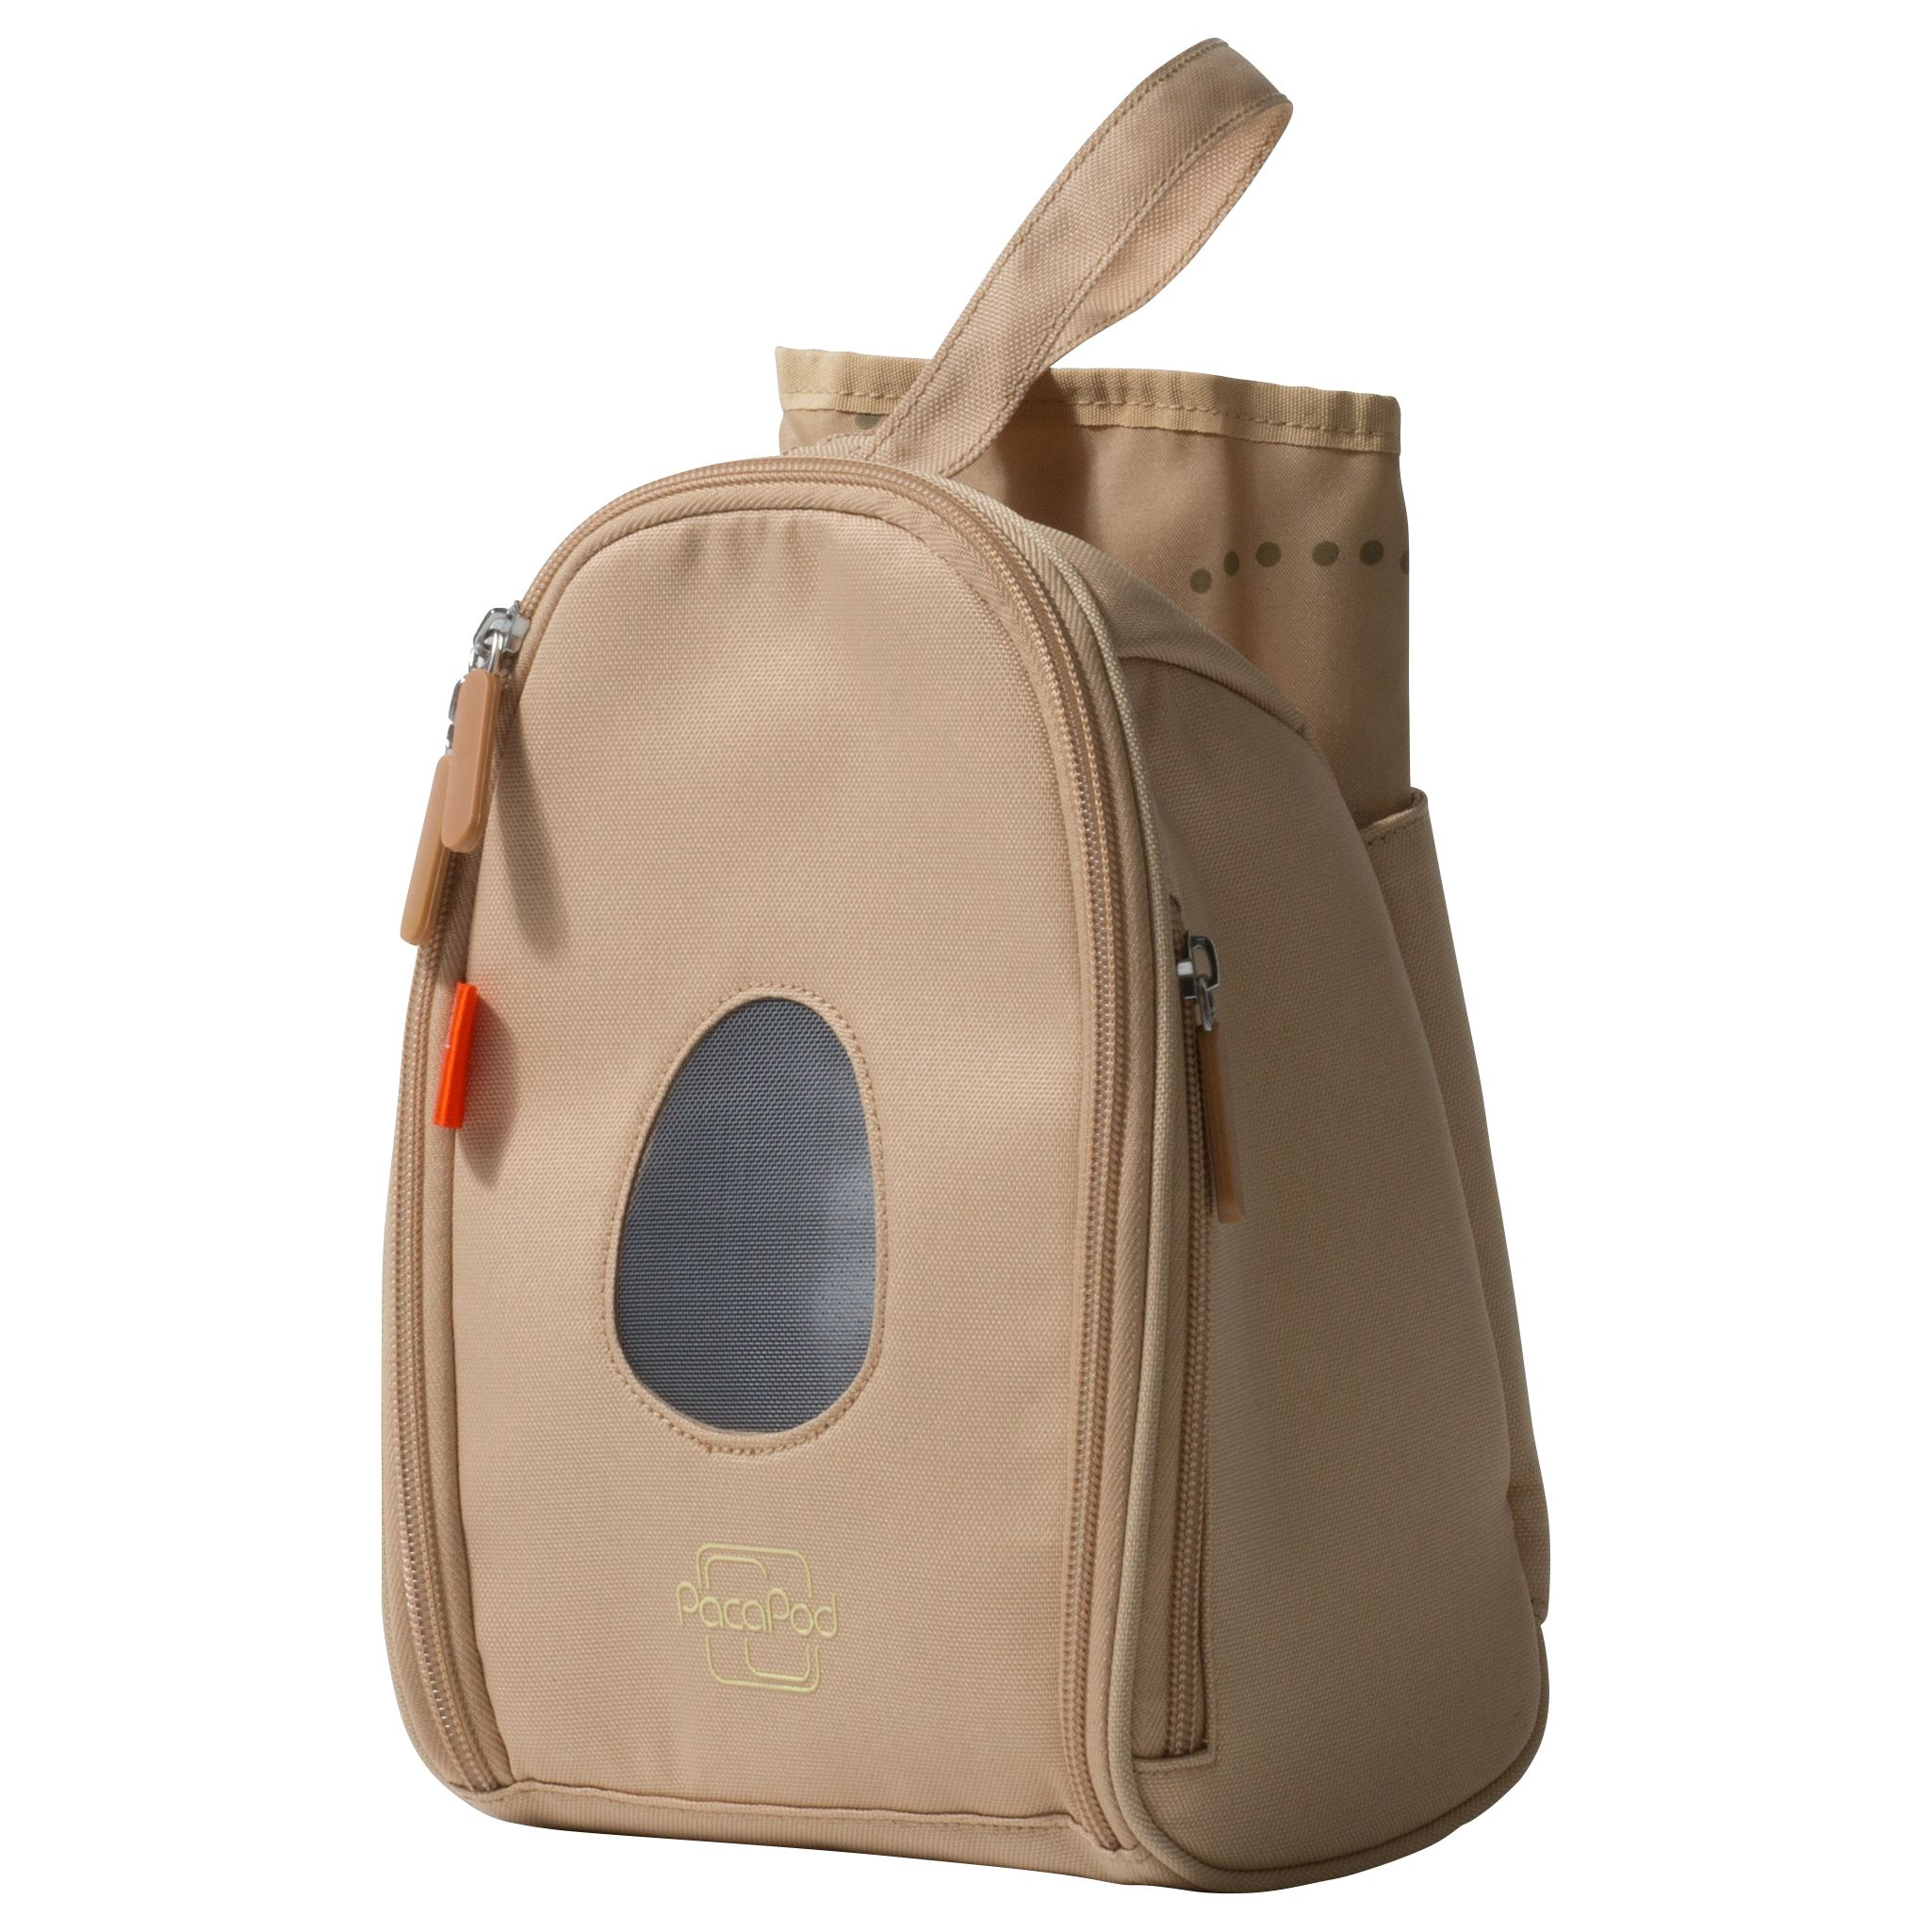 PacaPod PacaPod Changer Pod and Mat Changing Bag, Stone